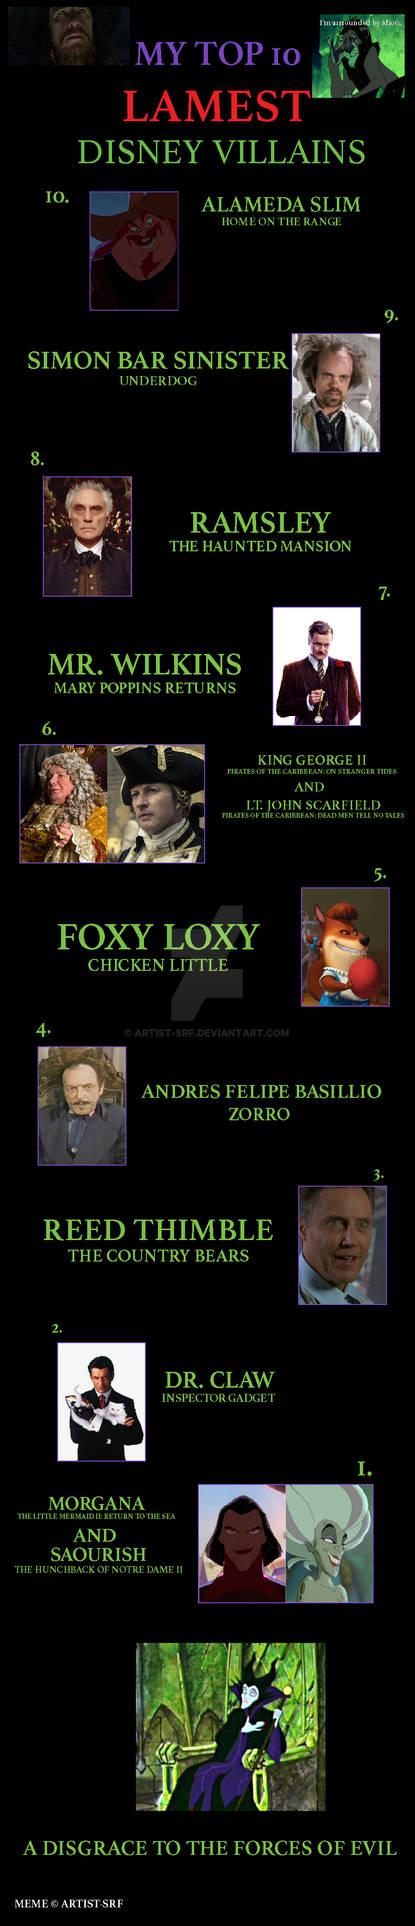 My Top 10 Lamest Disney Villains Examples